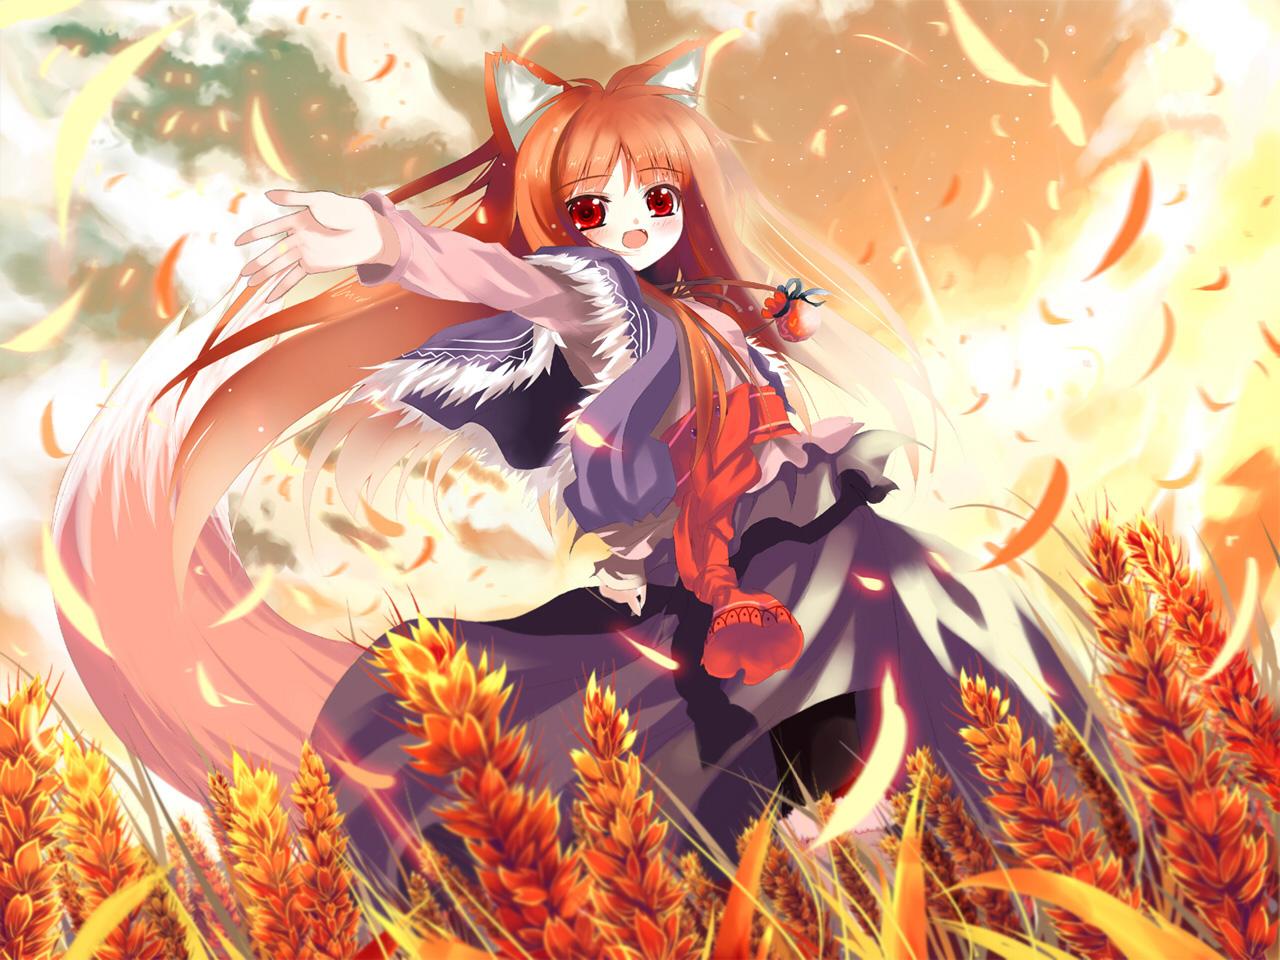 Spice and wolf hd wallpaper wallpapersafari - Anime wolf wallpaper ...